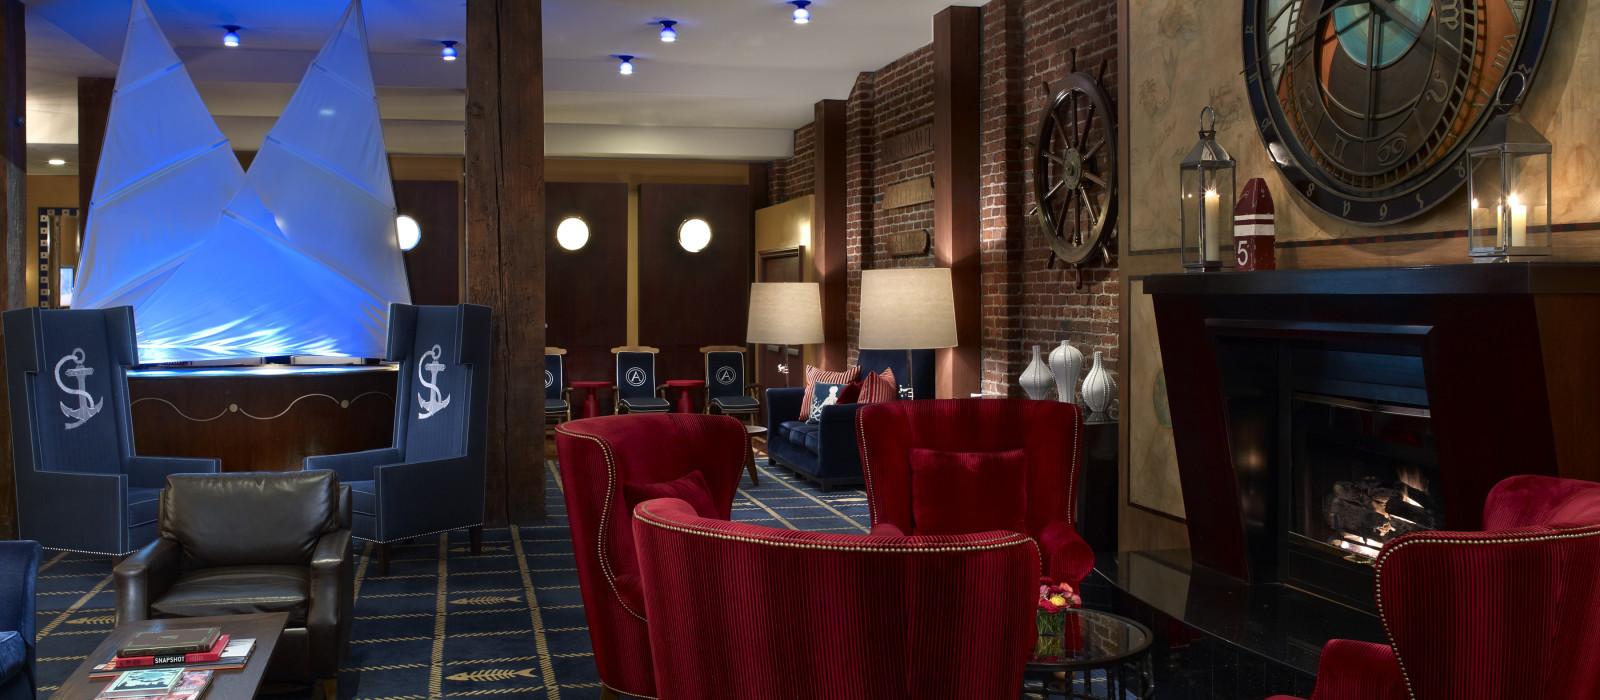 Hotel The Argonaut USA